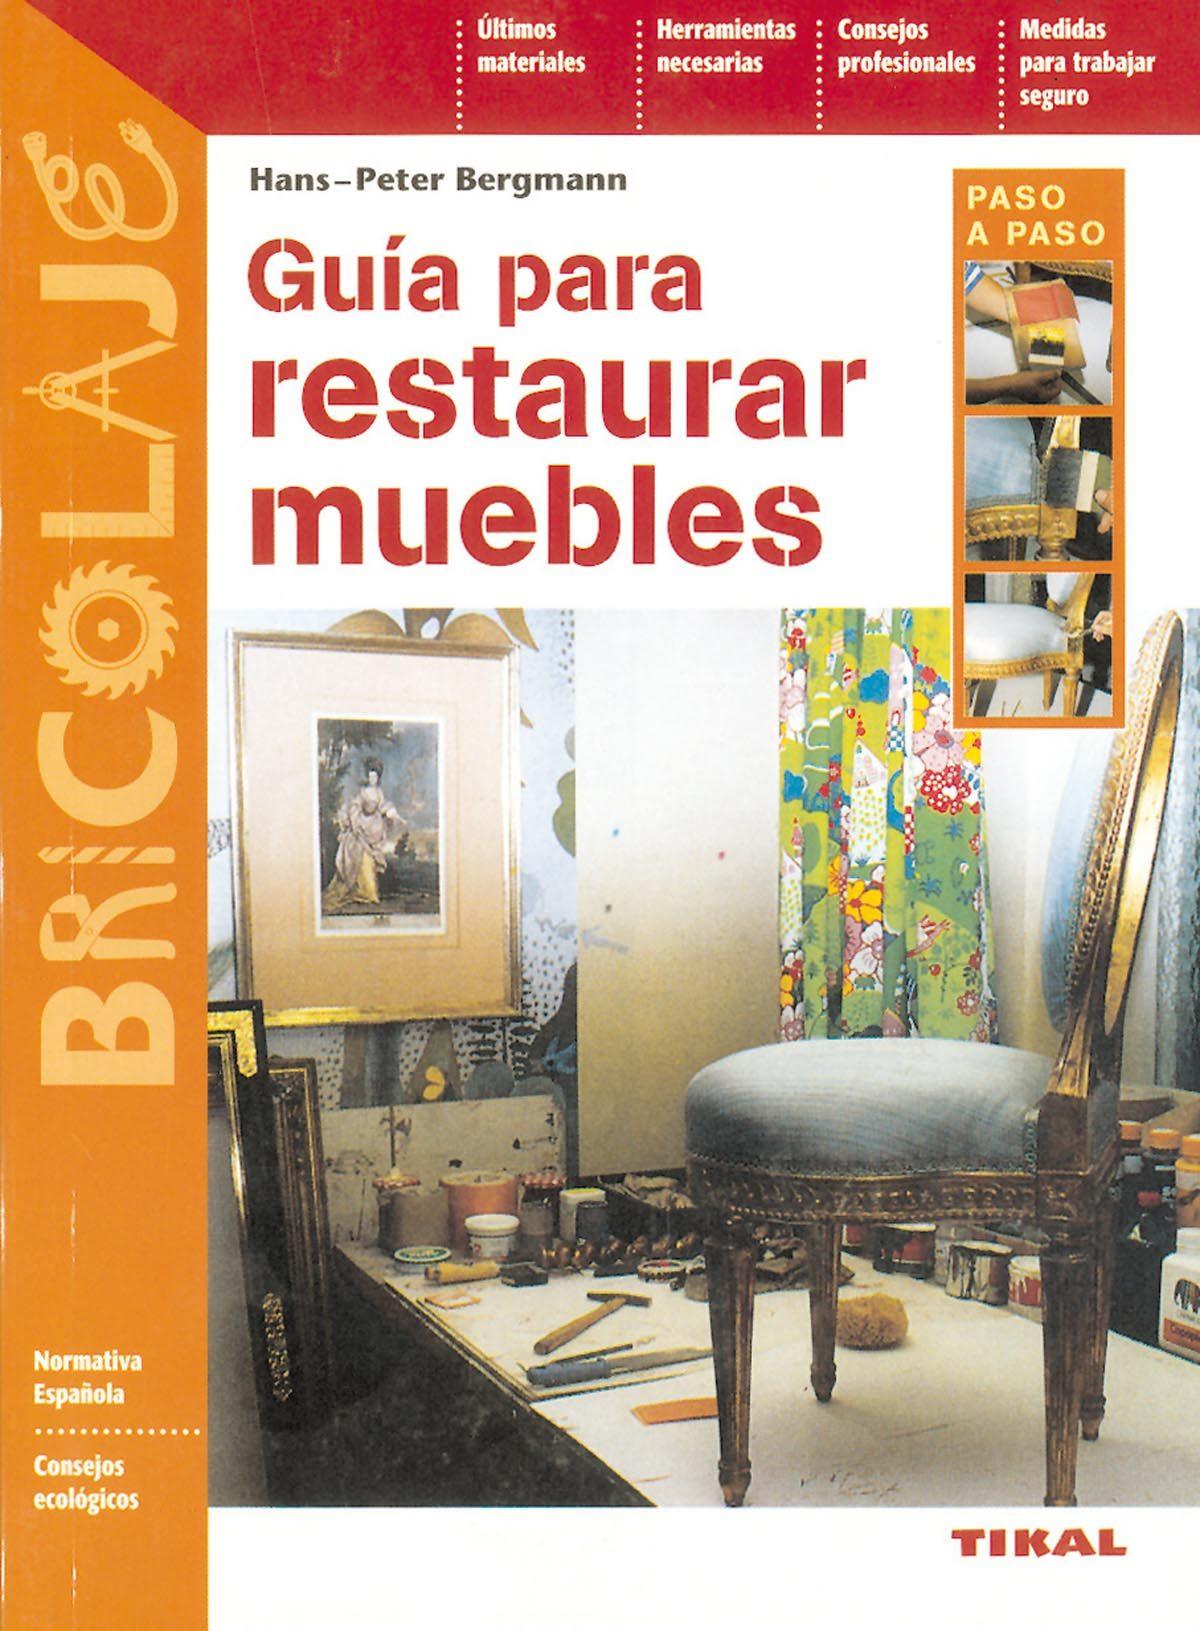 Comprar muebles para restaurar awesome muebles para restaurar recycrafts with comprar muebles - Venta de muebles antiguos para restaurar ...